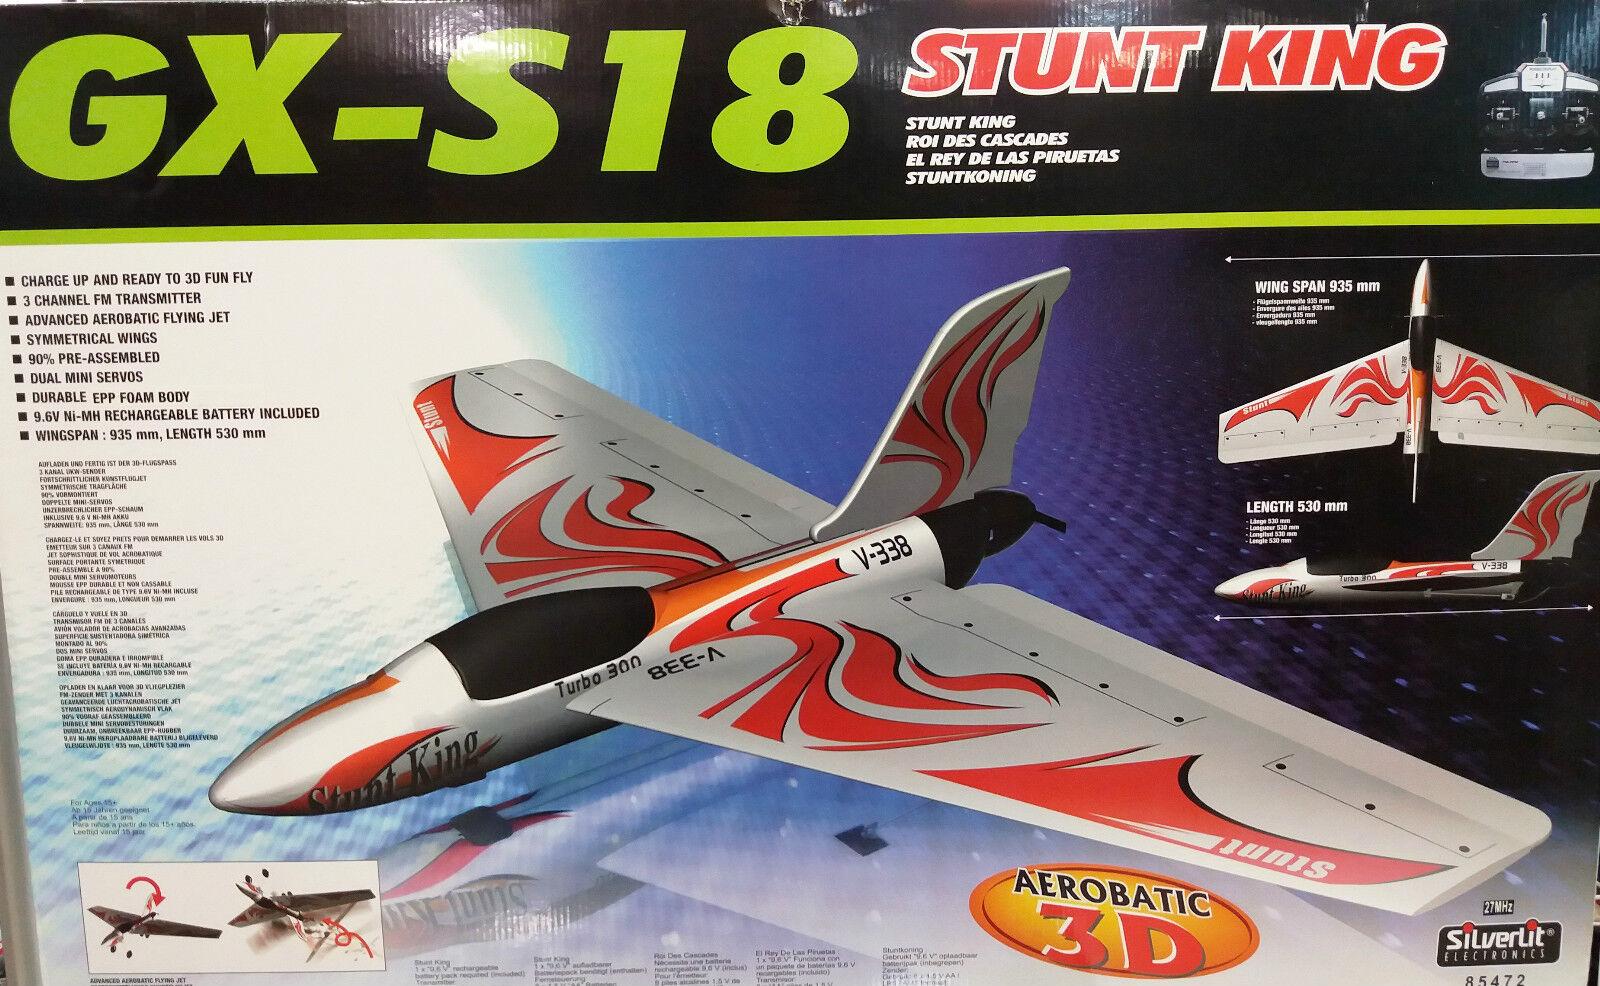 AVION GX-S18  STUNT KING RTF  ACROBATICO 3D